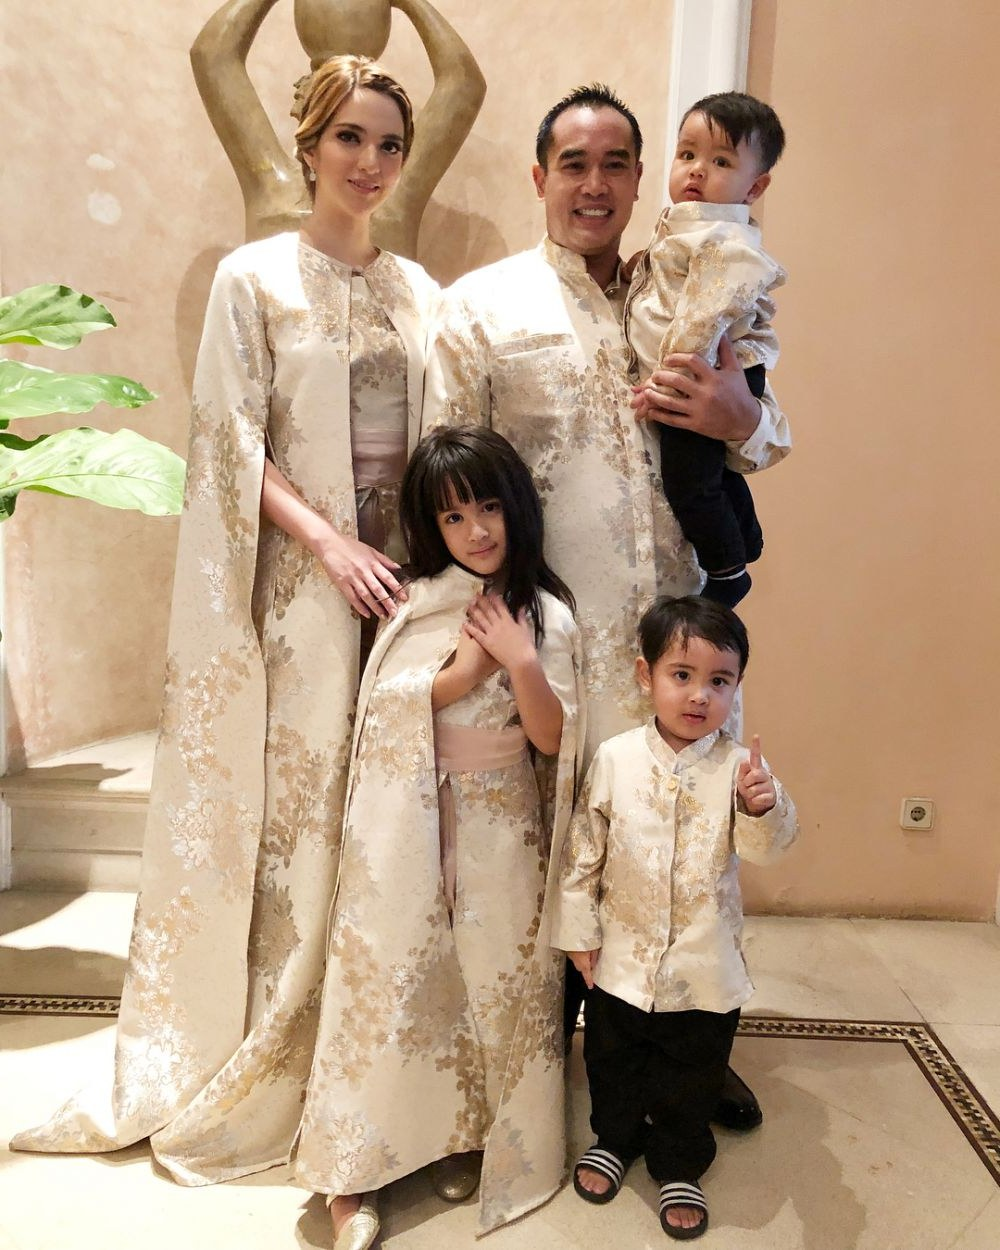 Bentuk Model Baju Lebaran Keluarga Artis J7do Potret 16 Seleb Pakai Baju Kembaran Saat Lebaran Kompak Abis